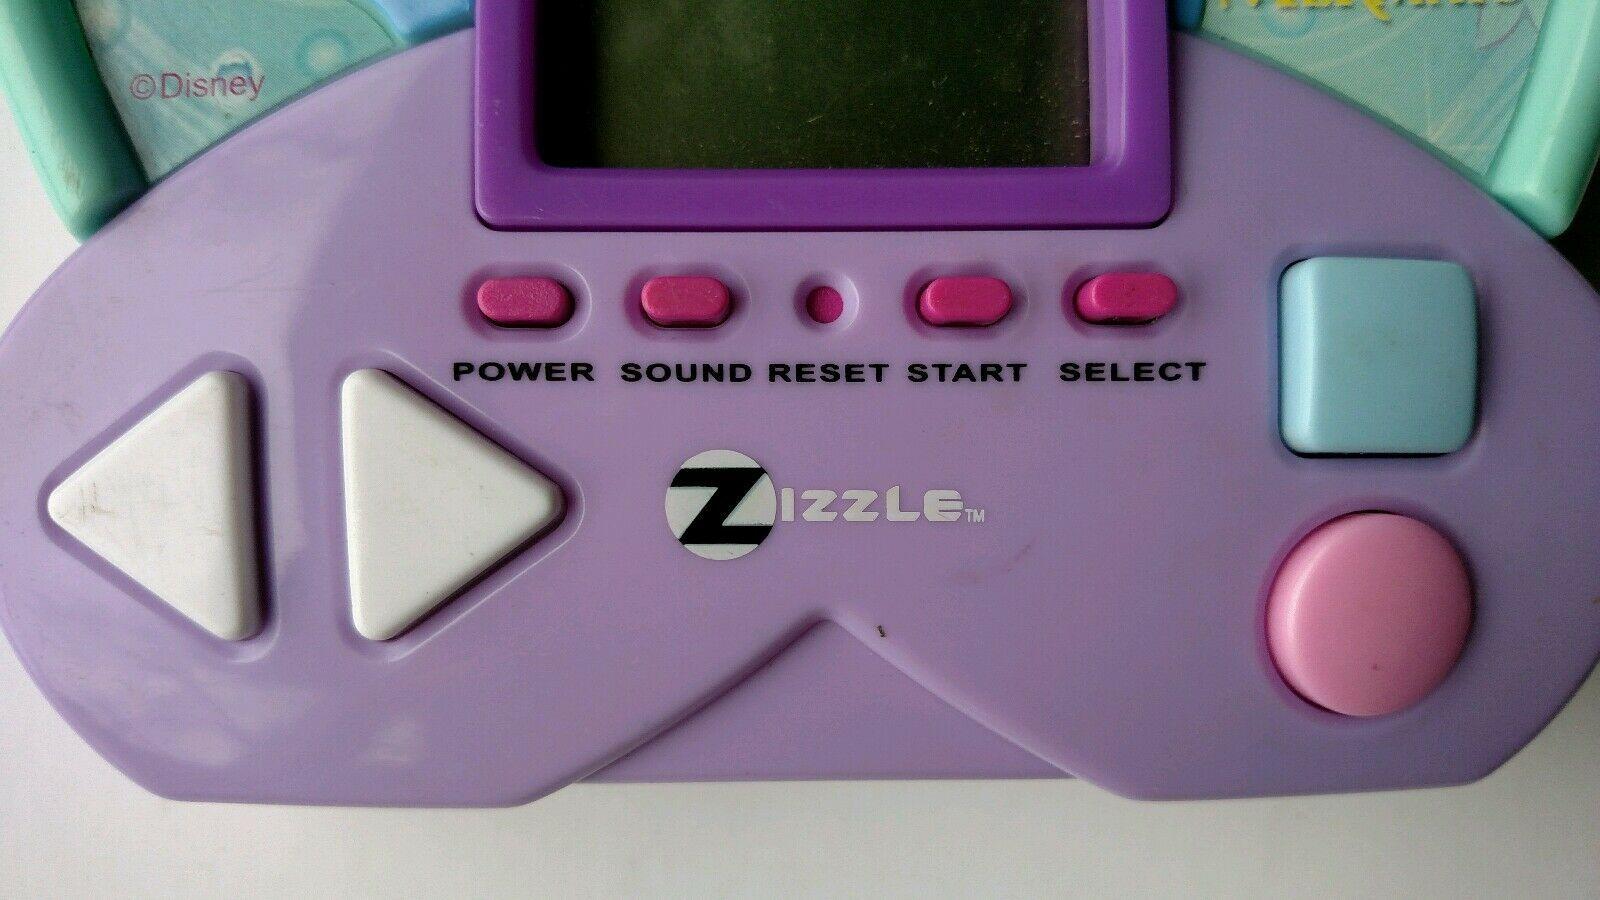 2006 handheld electronic Walt Disney Little Mermaid travel game with sound image 2